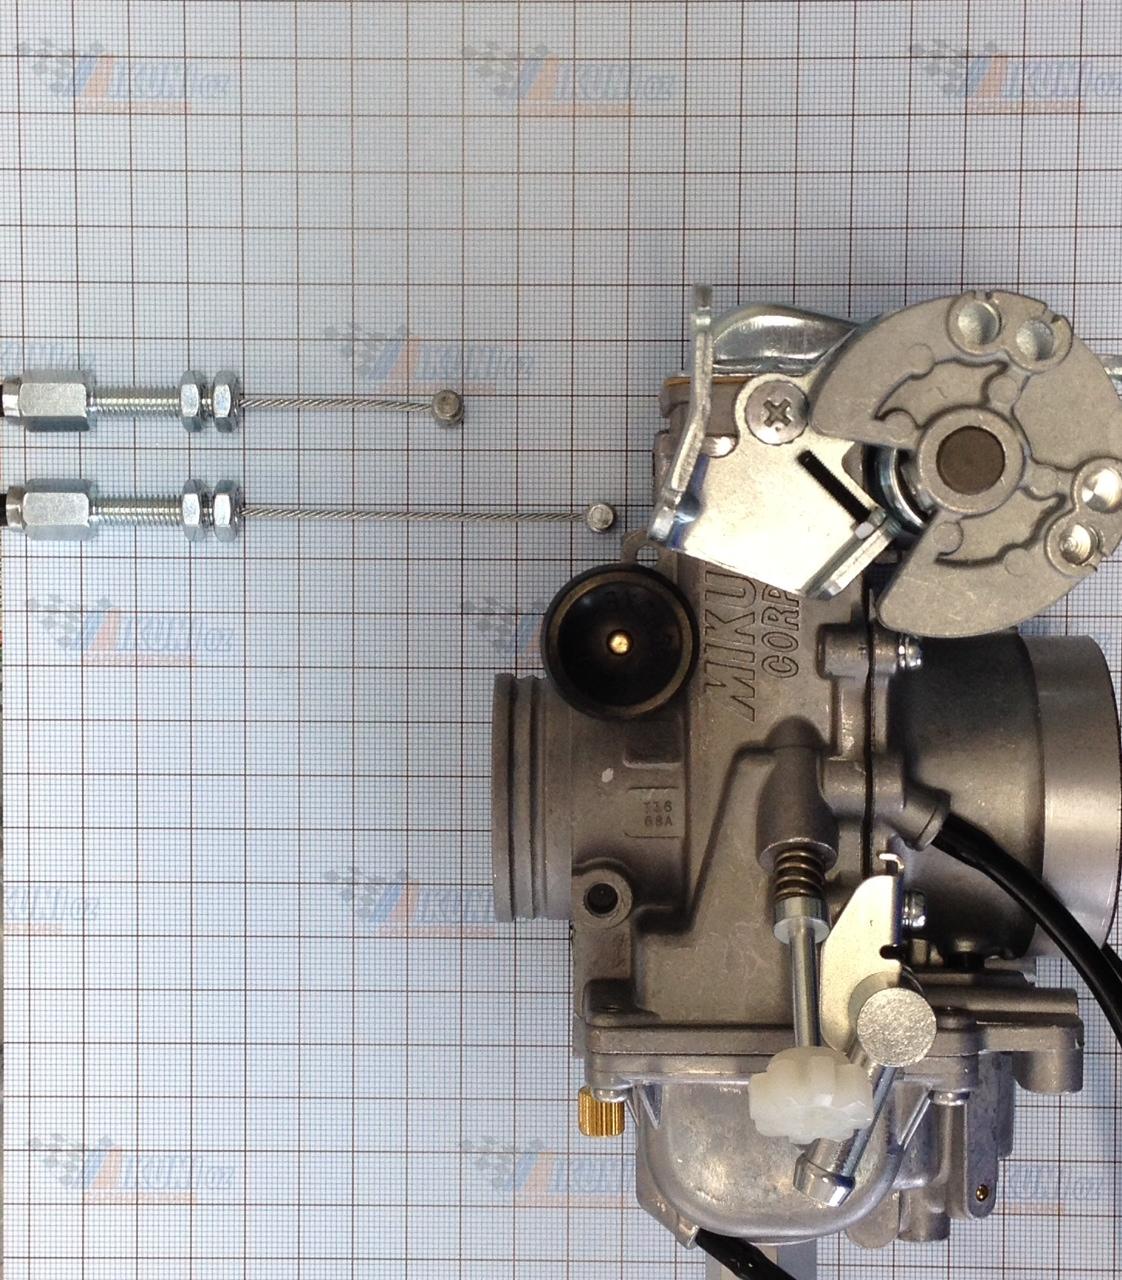 1 Tm40 6 Mikuni 40mm Flatslide Carb W Accelerator Pump Davidson Cv Carburetor Diagram Get Free Image About Wiring Mikunioz